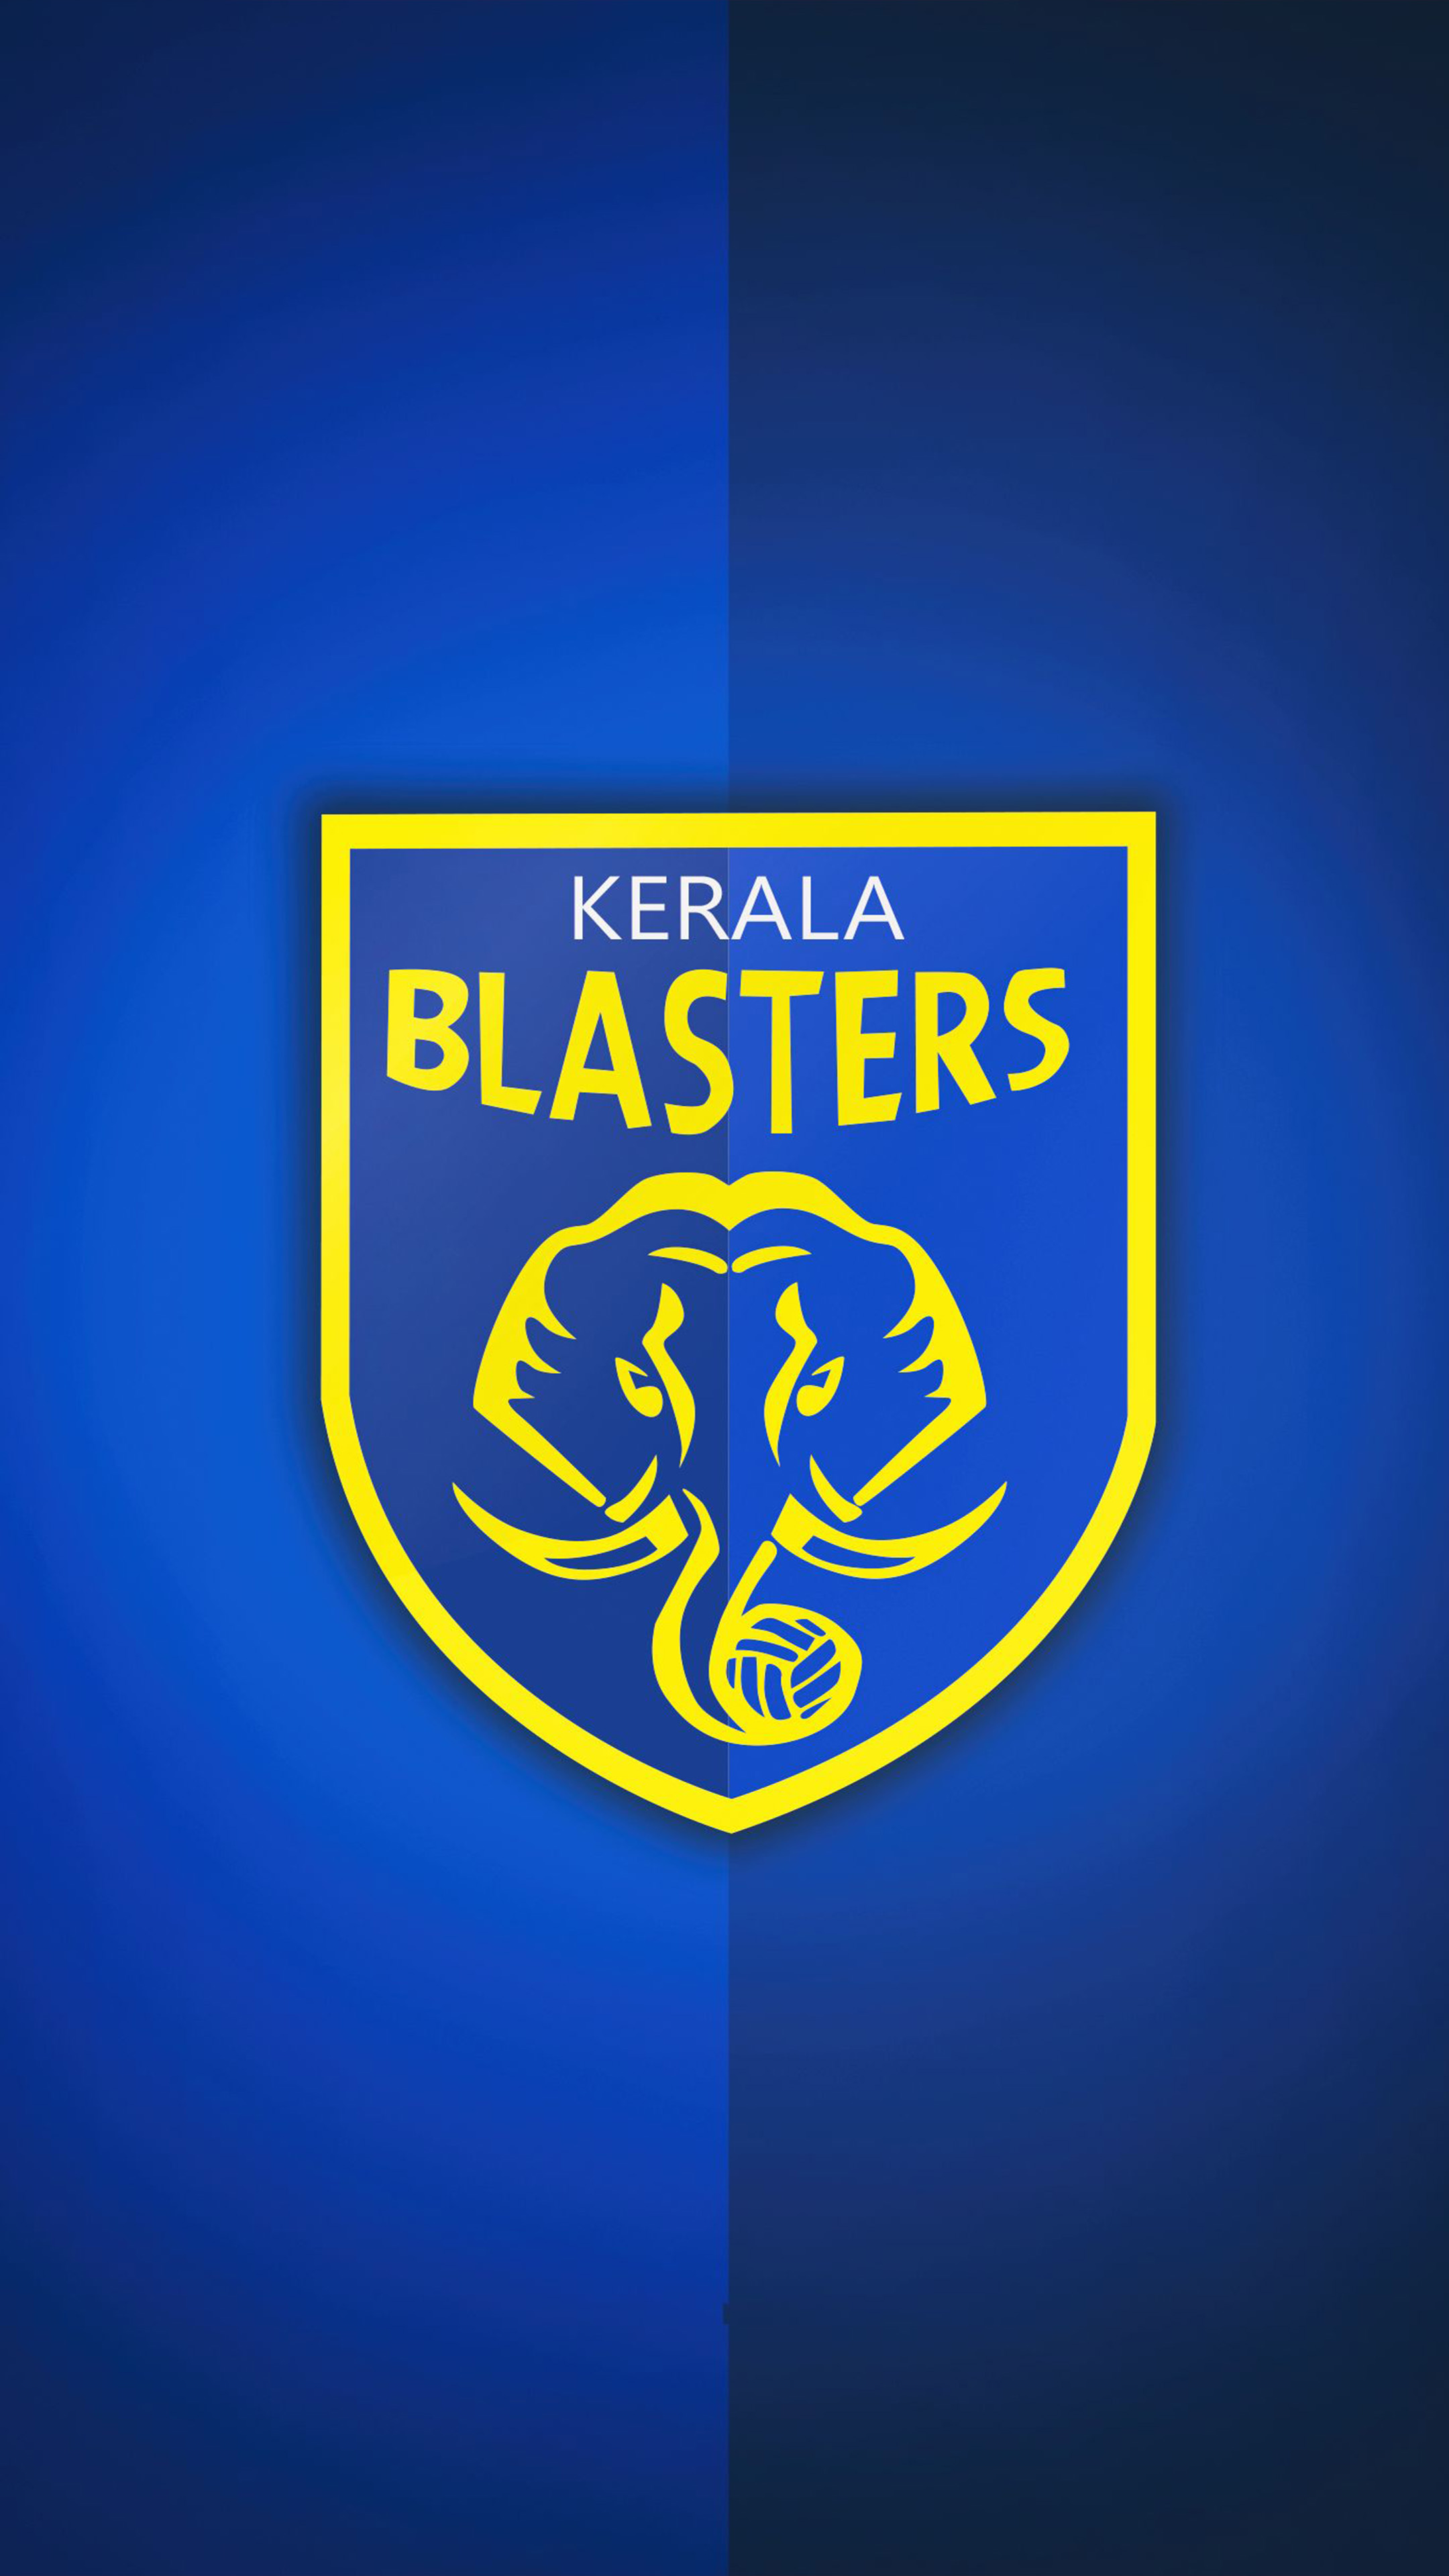 Download Kerala Blasters 2018 Pure 4K Ultra HD Mobile Wallpaper 2160x3840